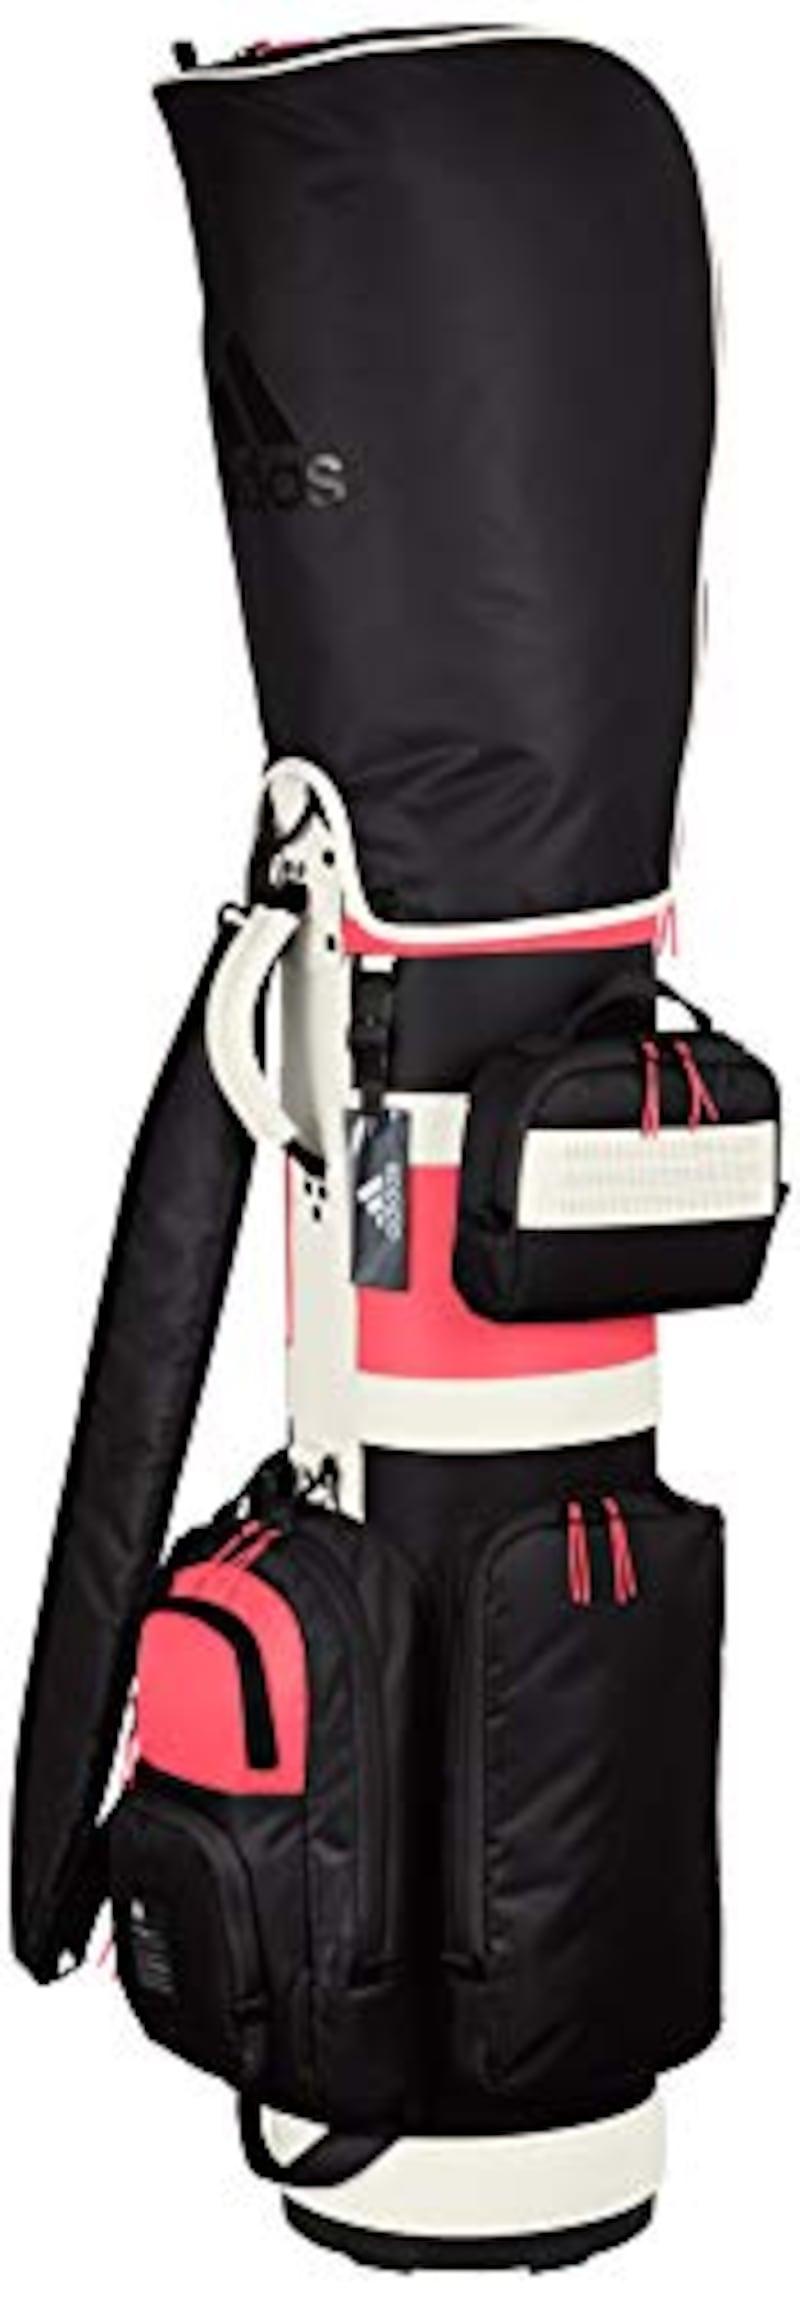 adidas Golf(アディダスゴルフ),キャディーバッグ ブラック,IUG05